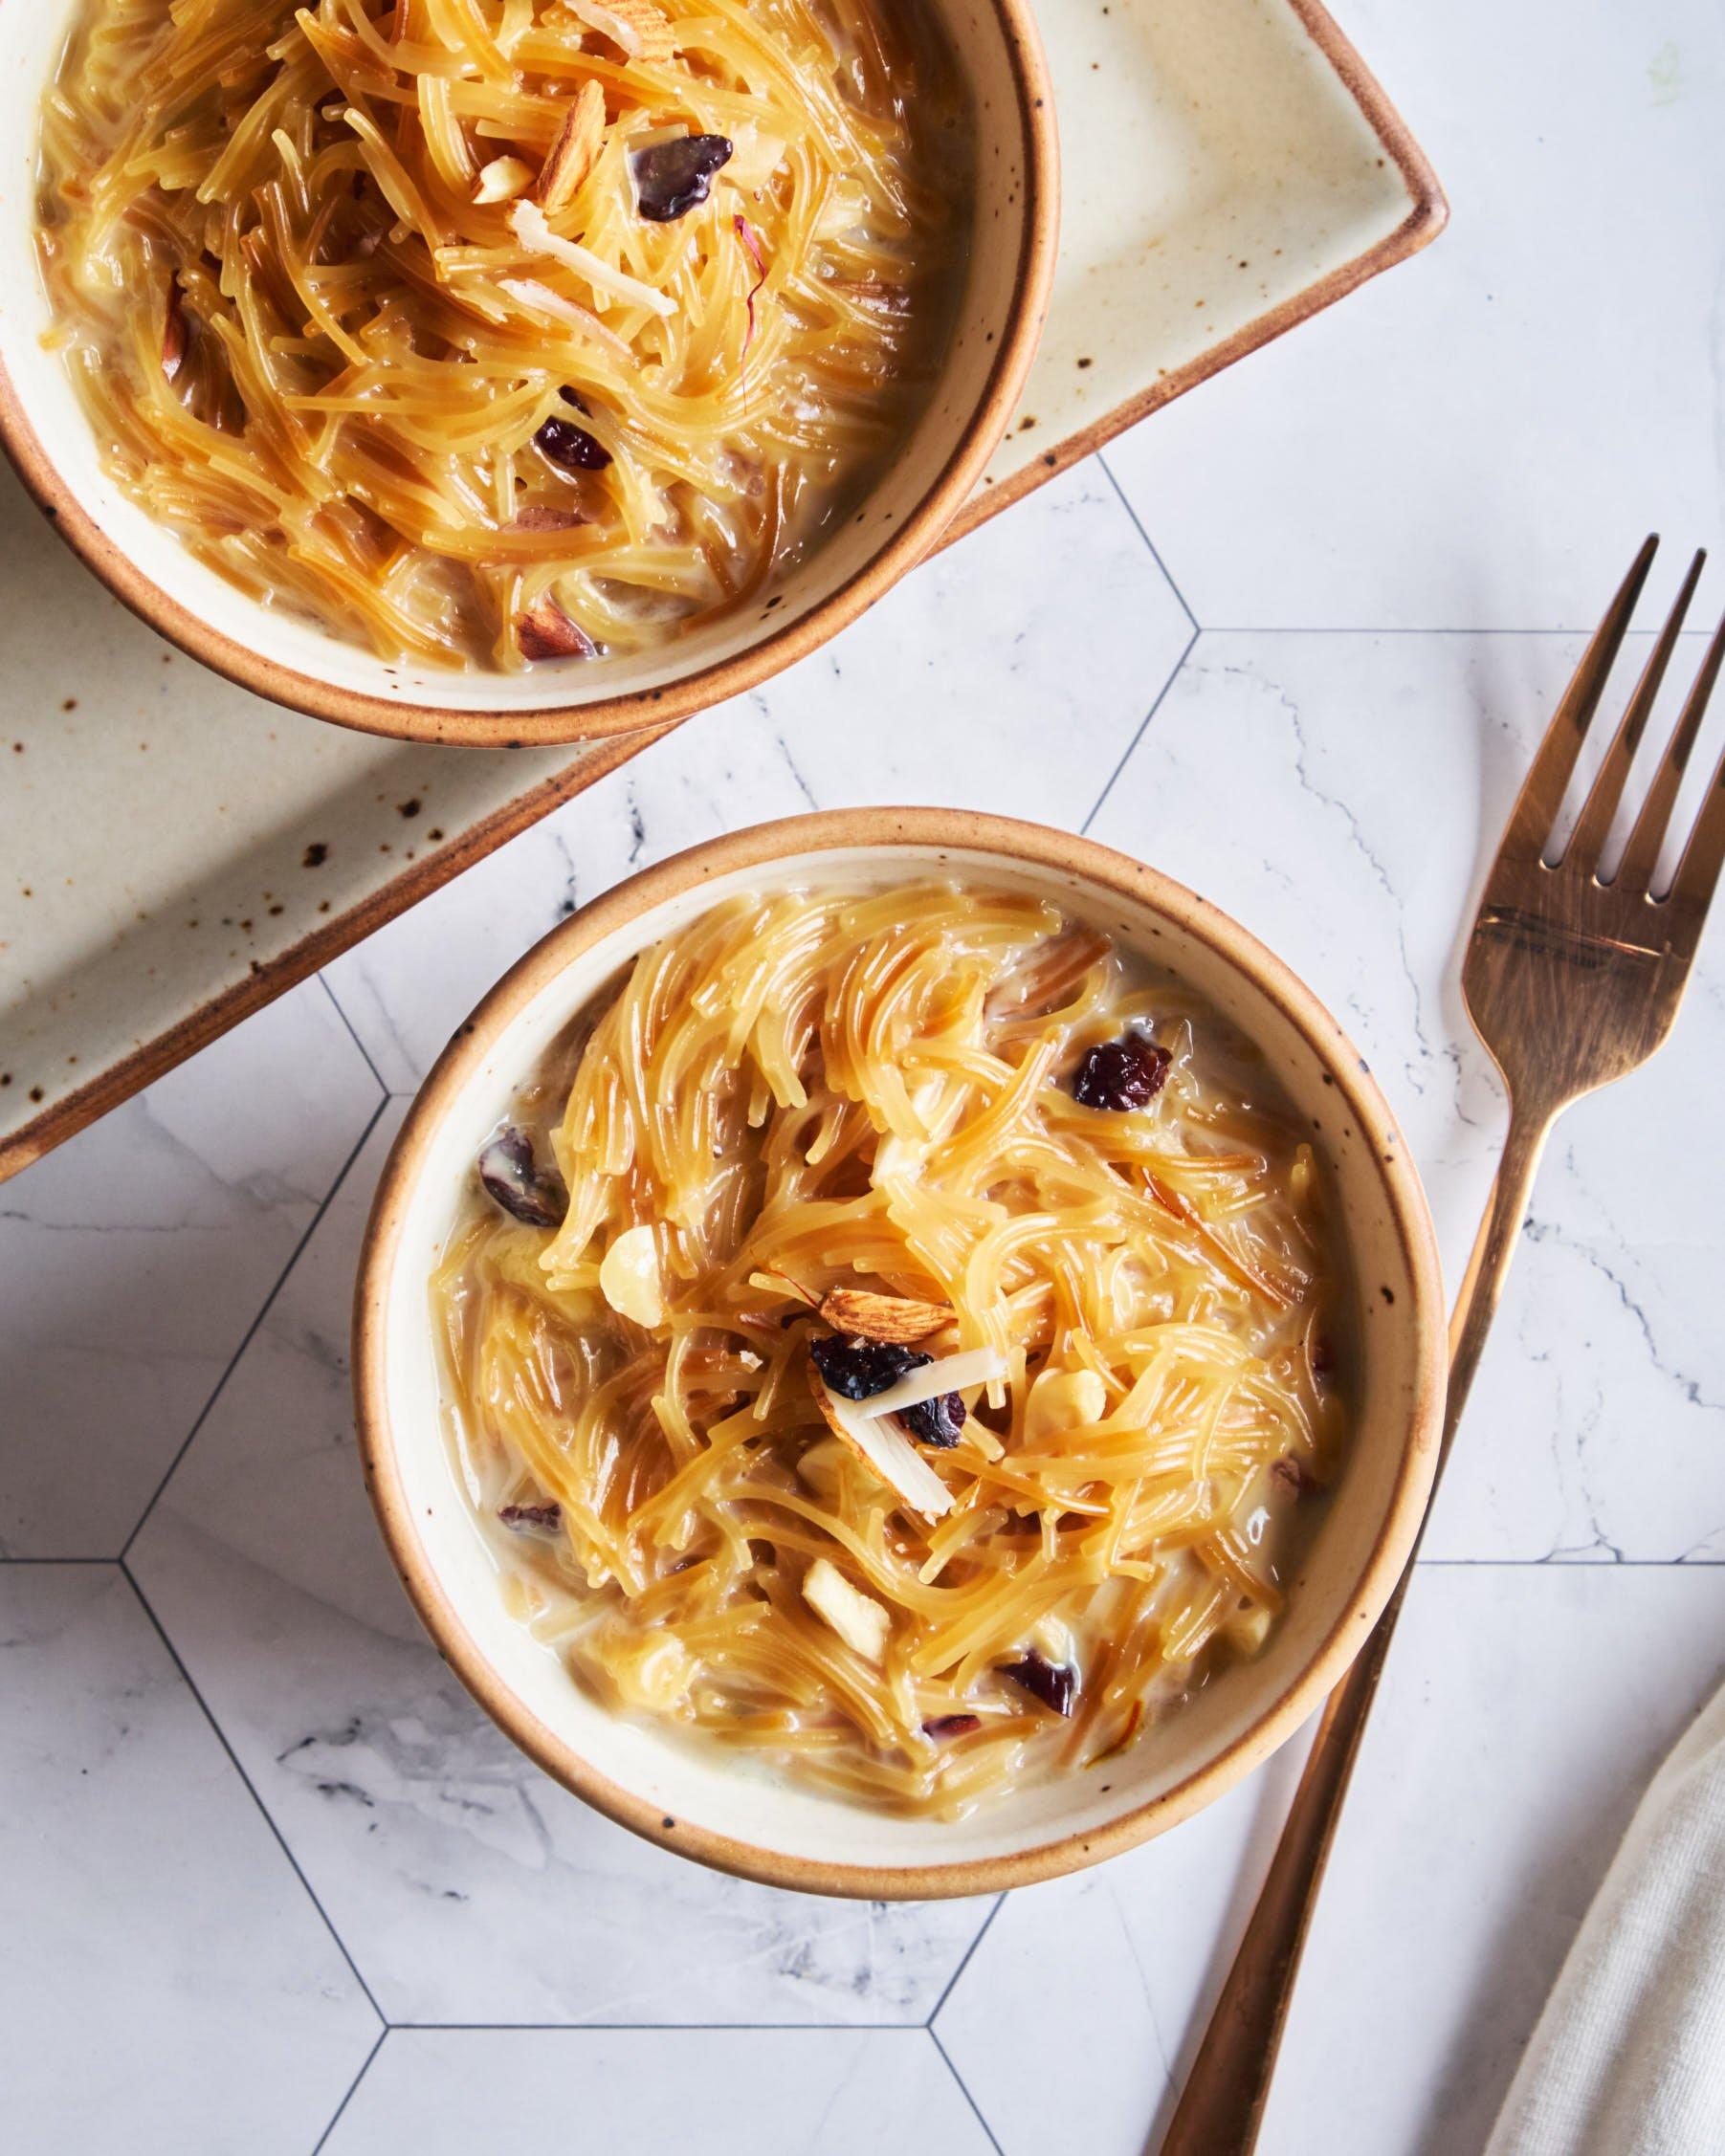 Vermicelli Pudding